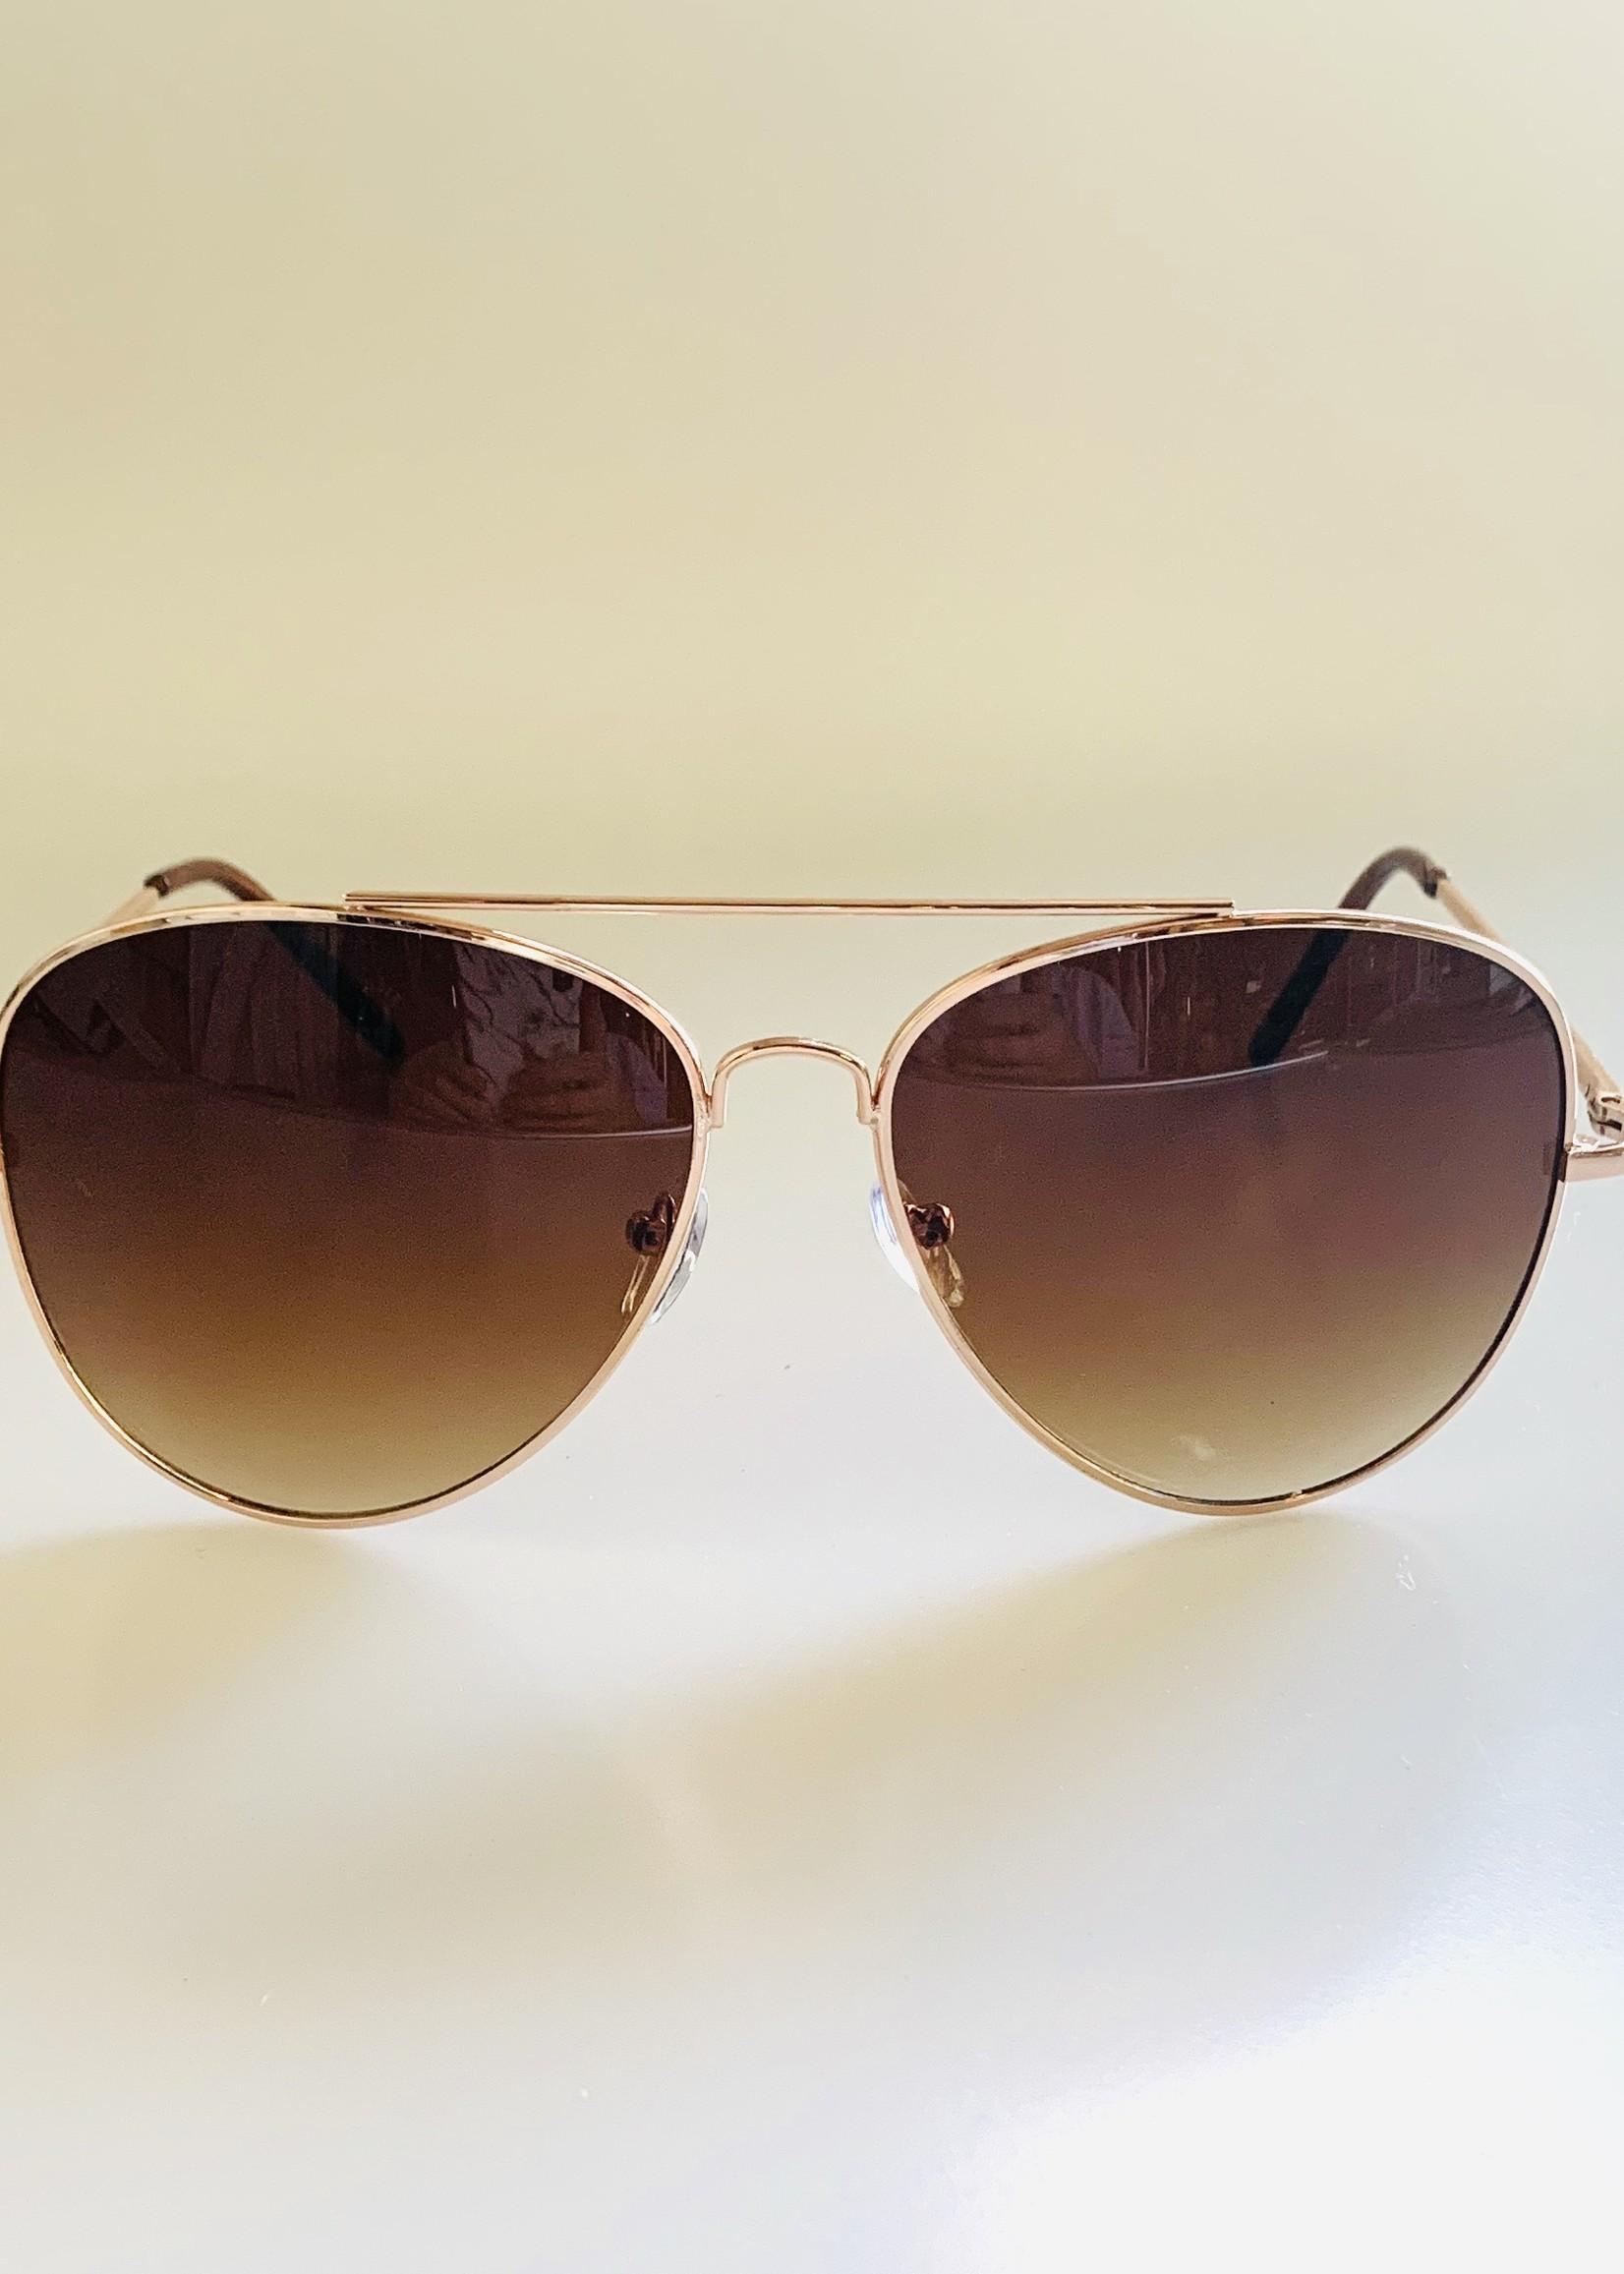 3293 sunglasses